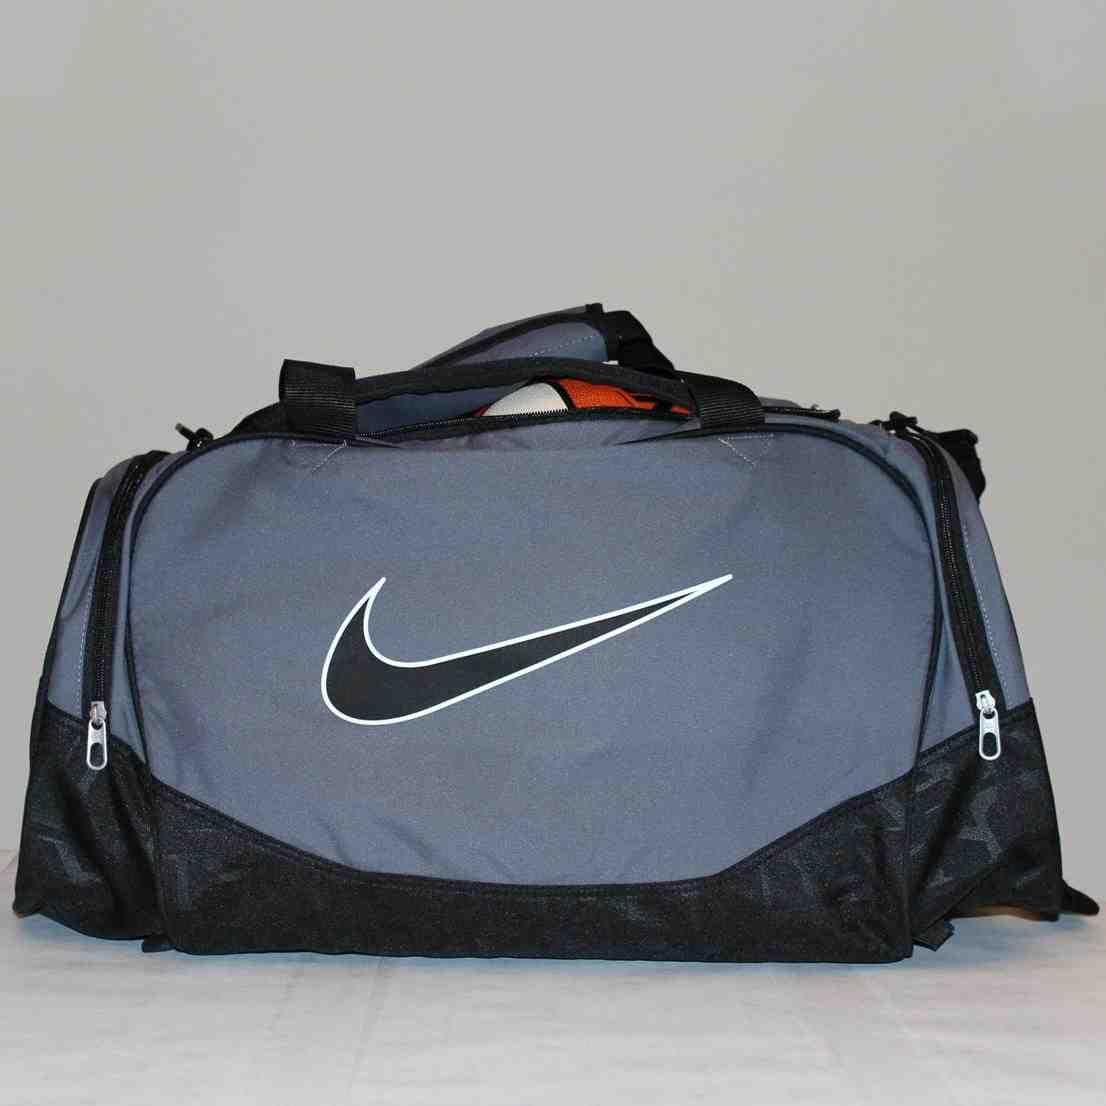 a1e4b3b6b44 ... Bling Nike Brasilia Gym Bag with Swarovski Crystal Bedazzled Etsy   super quality 89b64 eacb2 Nike Elite Basketball Duffle Bag ...